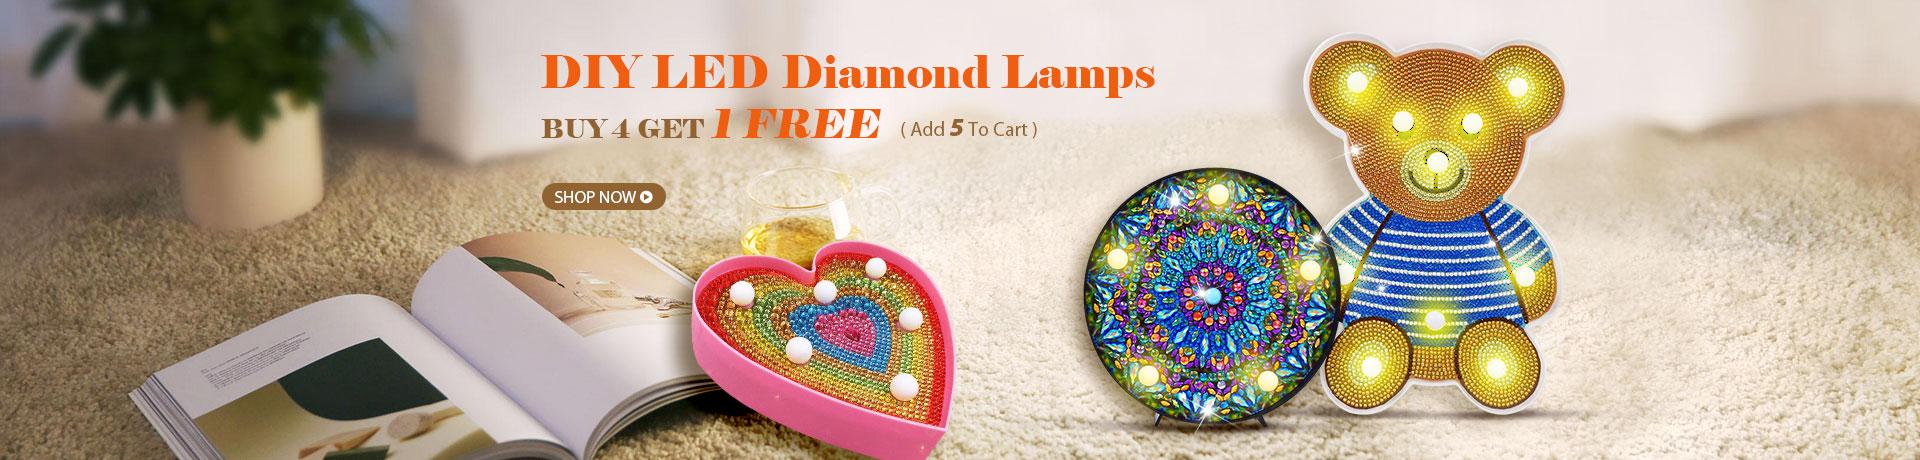 DIY LED Diamond Lamps